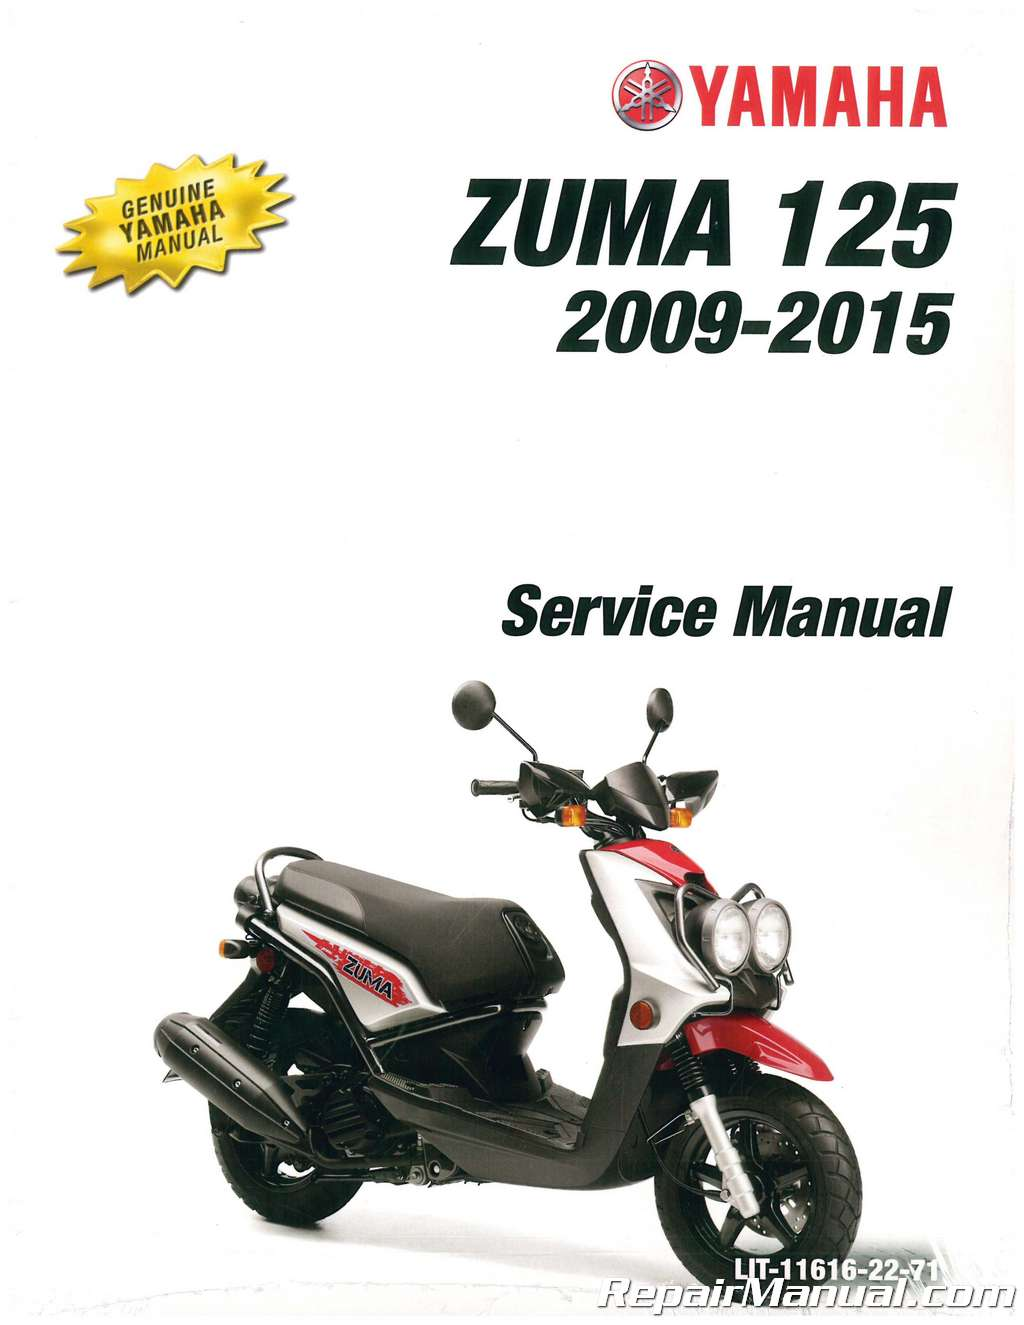 yamaha scooter fuse box 1 wiring diagram source 2004 Yamaha Zuma